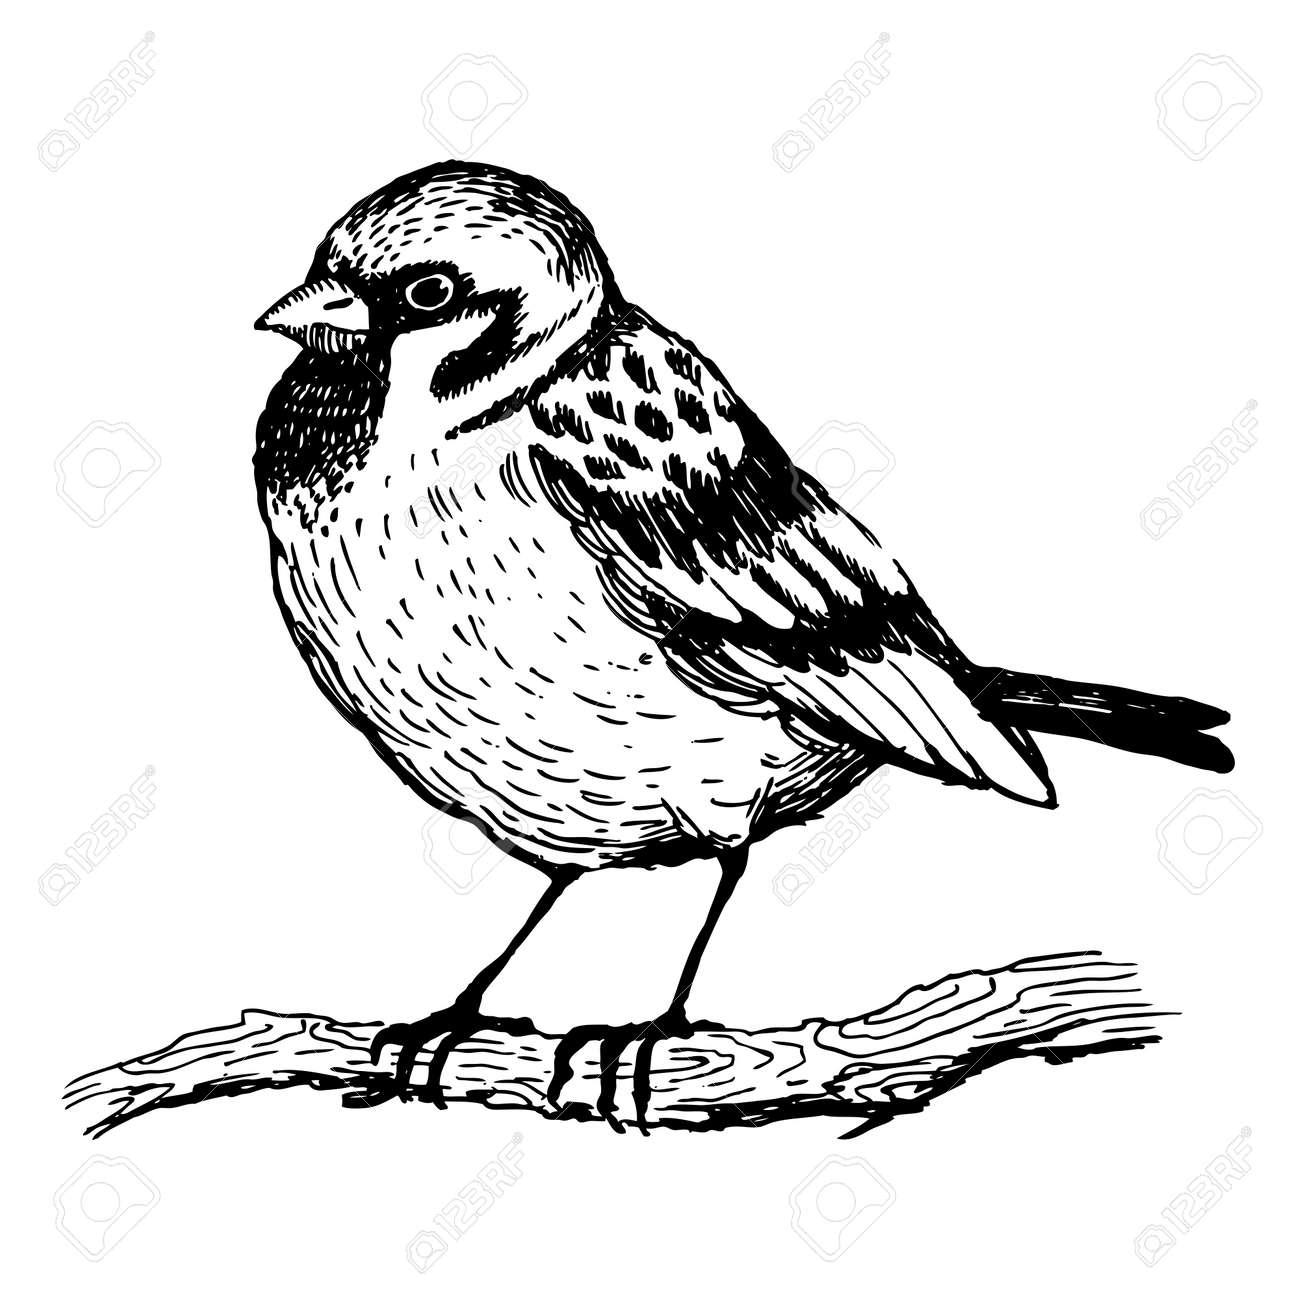 Sparrow bird engraving vector illustration. Scratch board style imitation. Hand drawn image. - 86300460